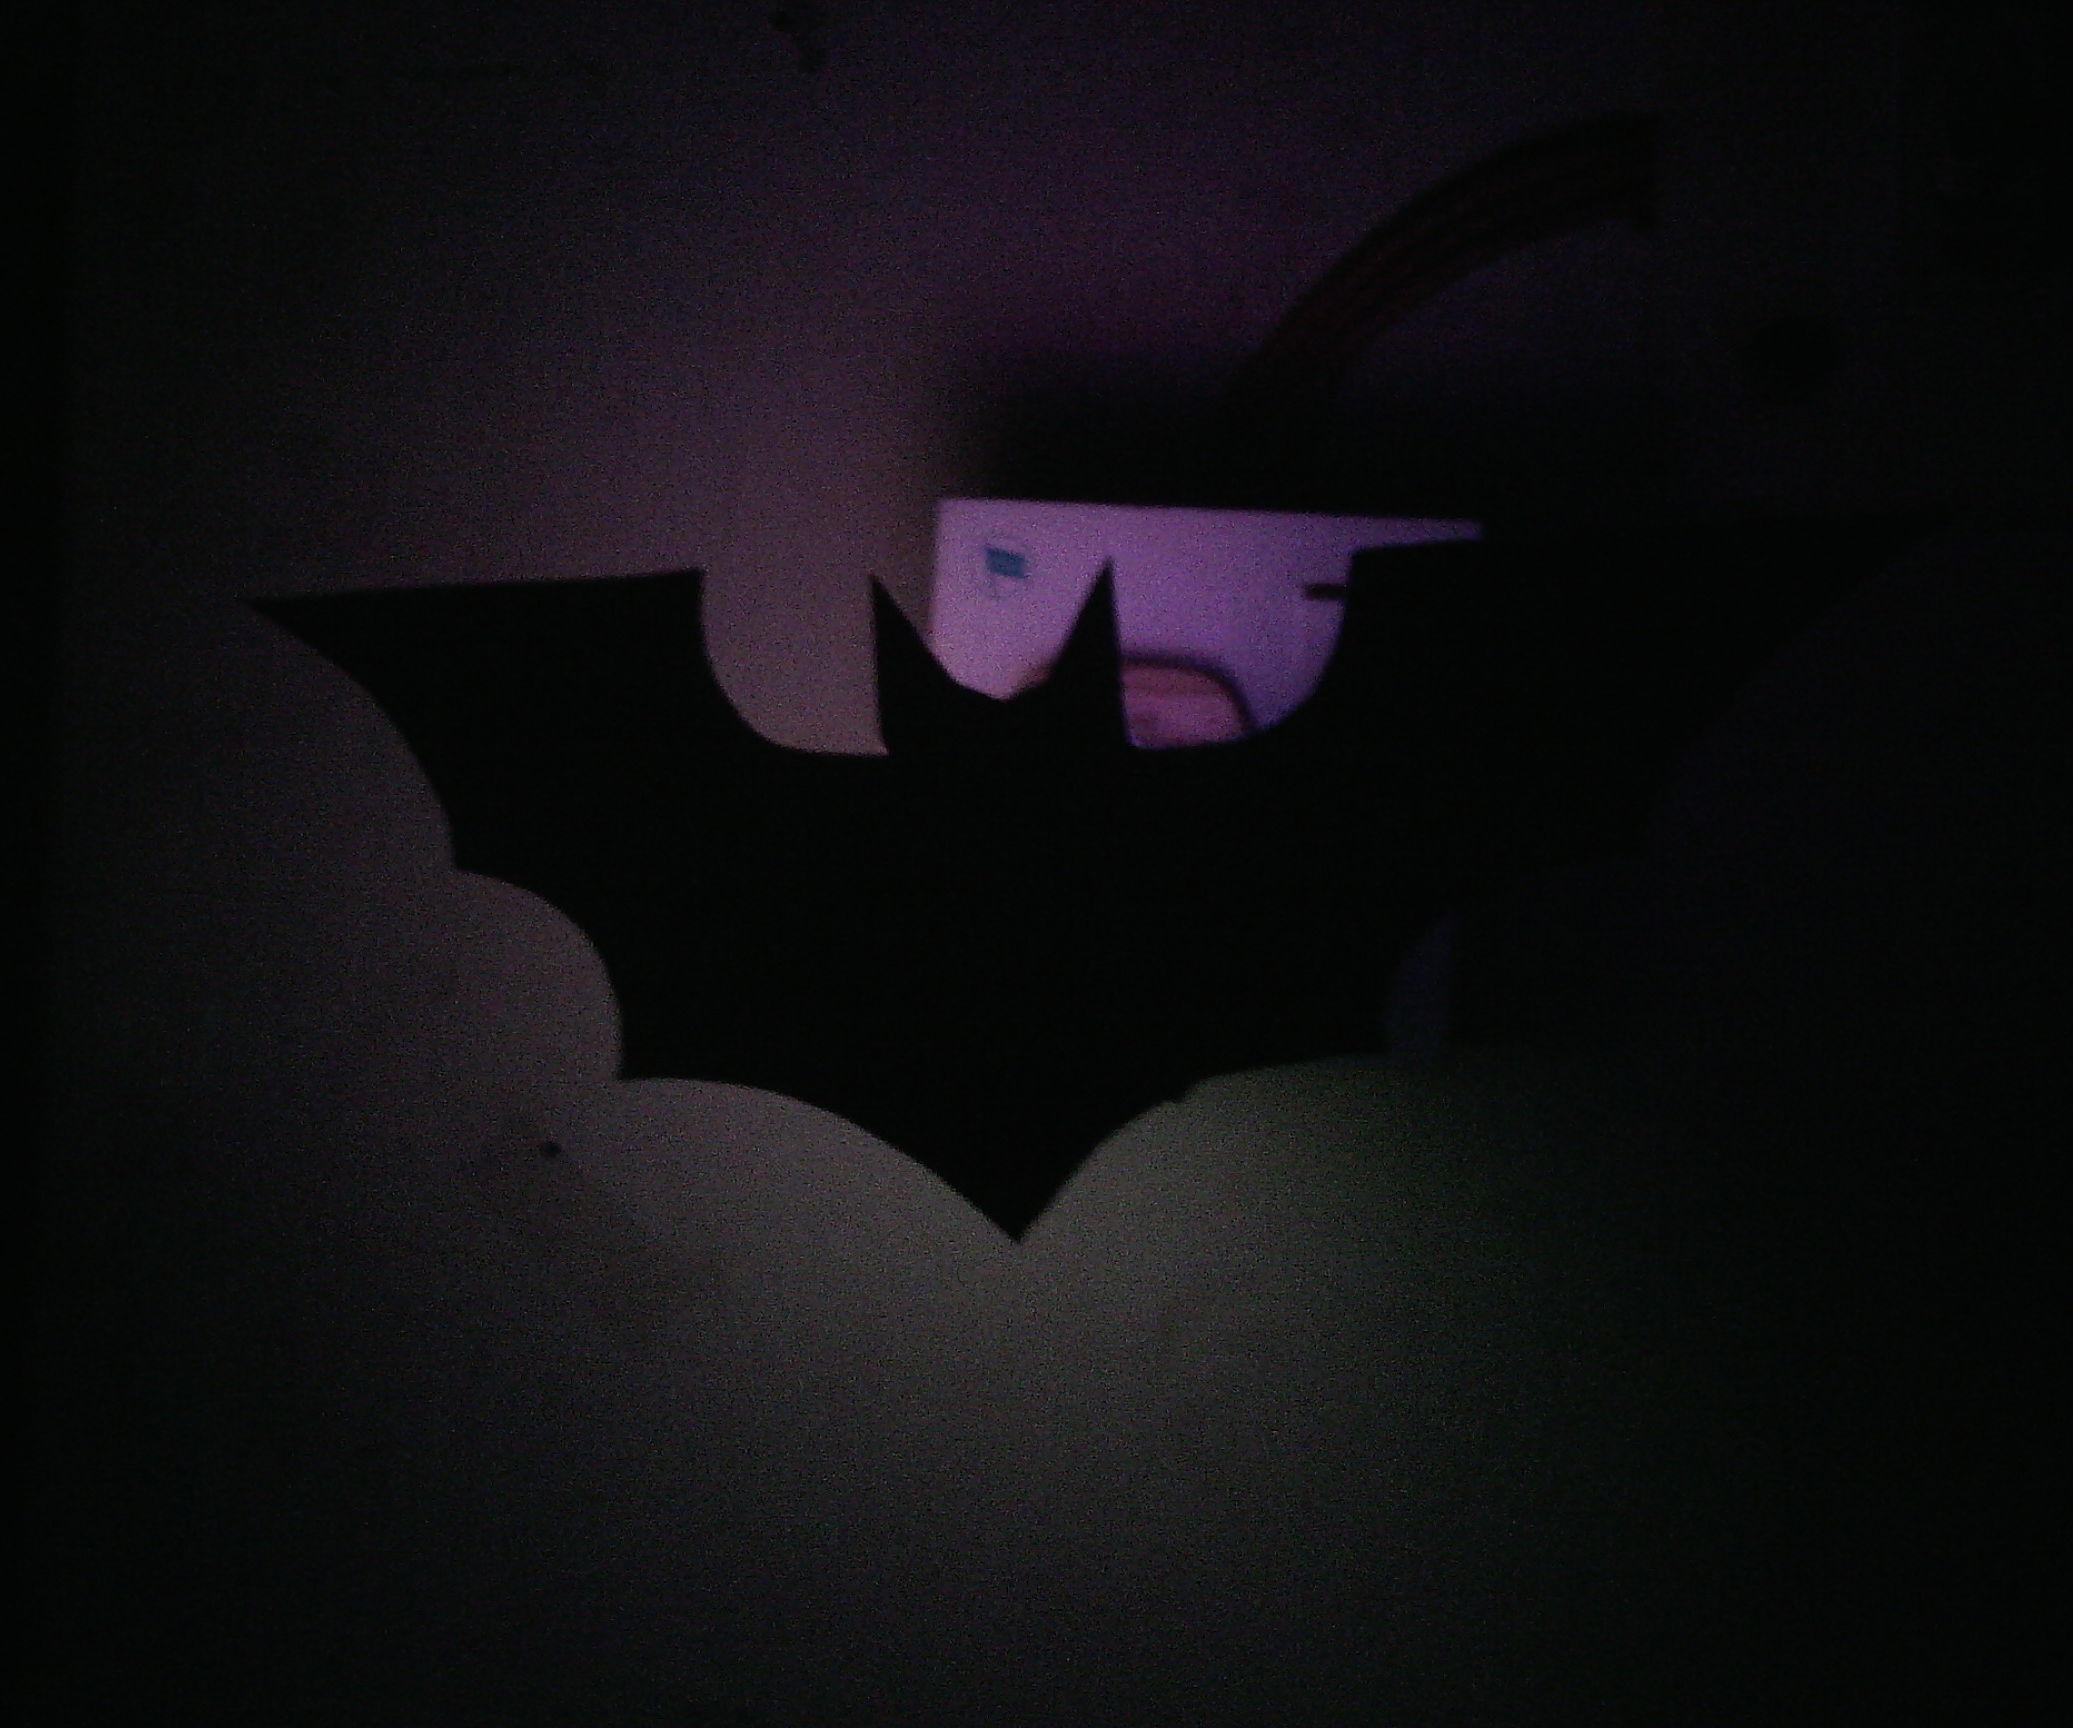 Batman logo- Light covering